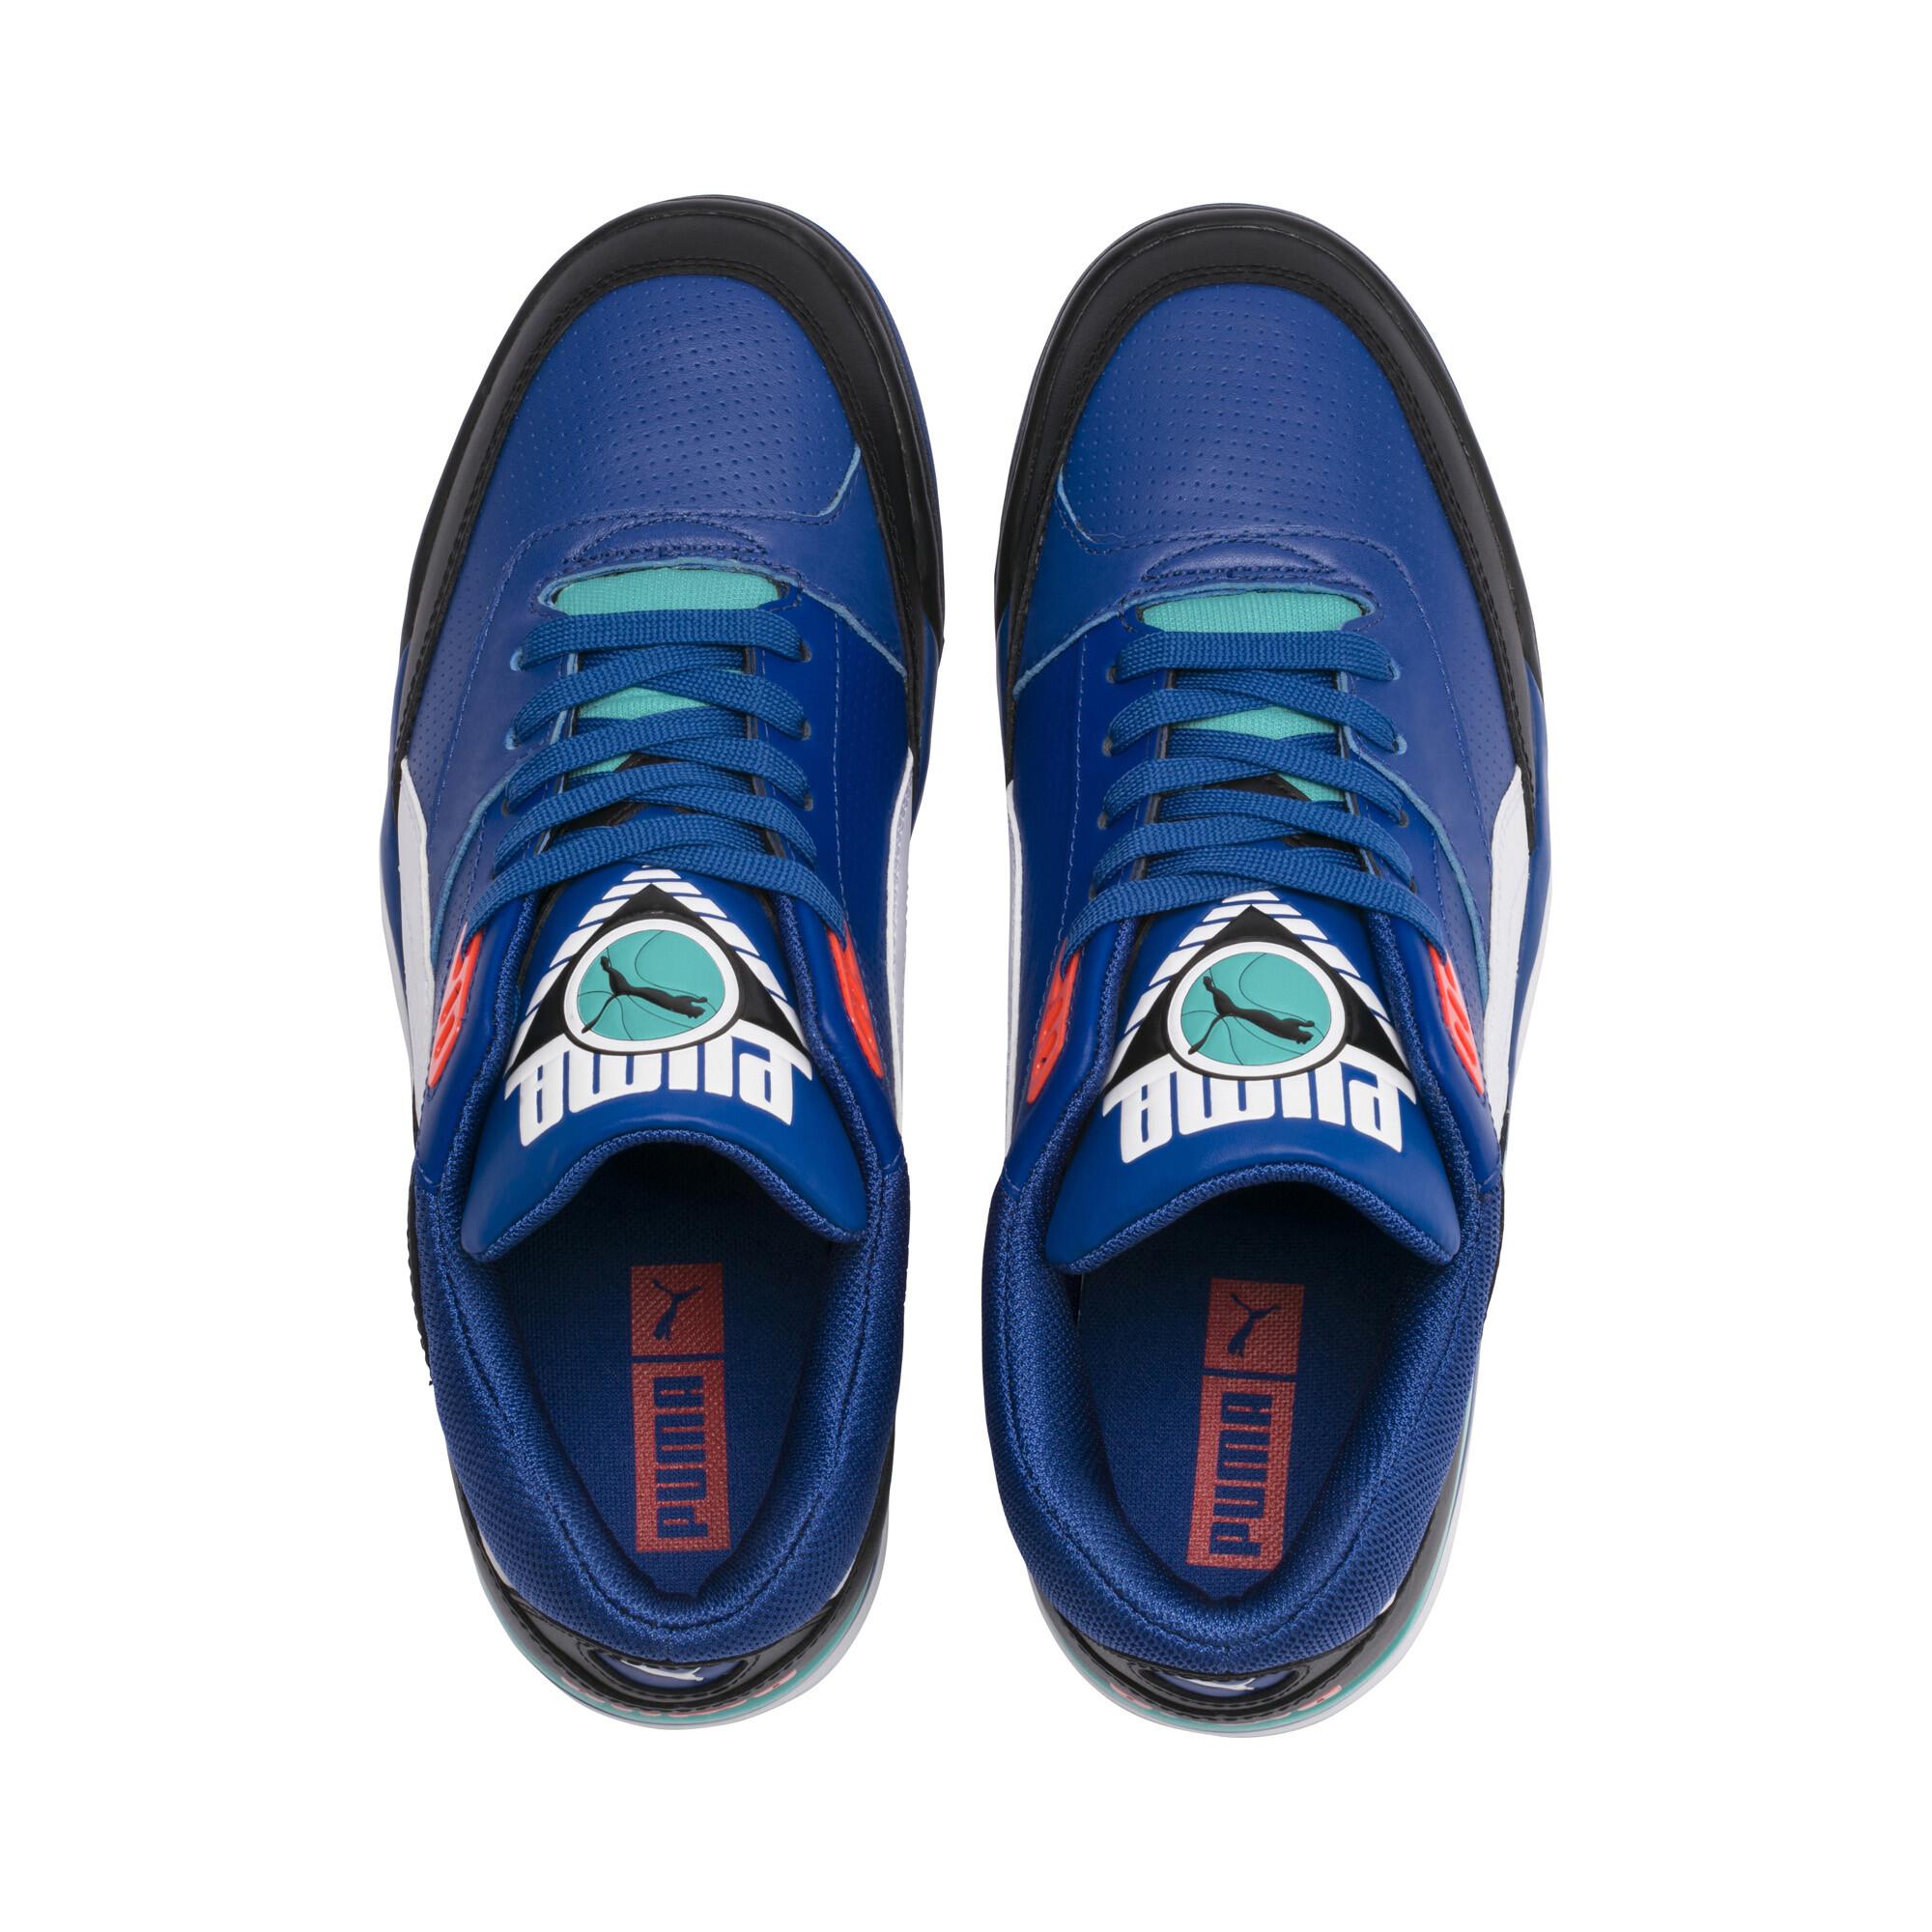 Indexbild 40 - PUMA Palace Guard Sneaker Unisex Schuhe Sport Classics Neu